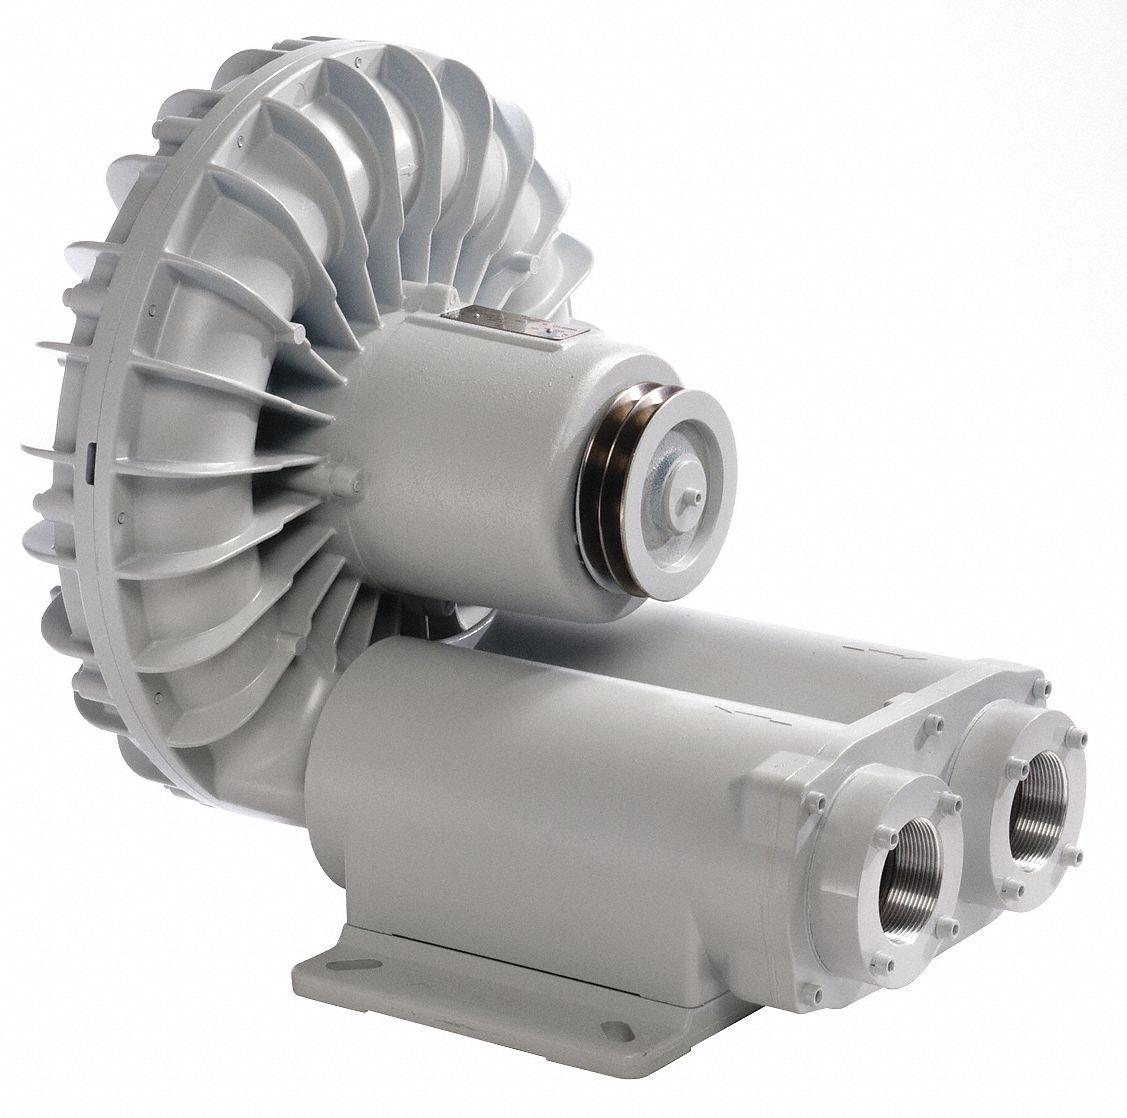 Miniature Regenerative Blowers : Fuji electric separate drive regenerative blower quot inlet